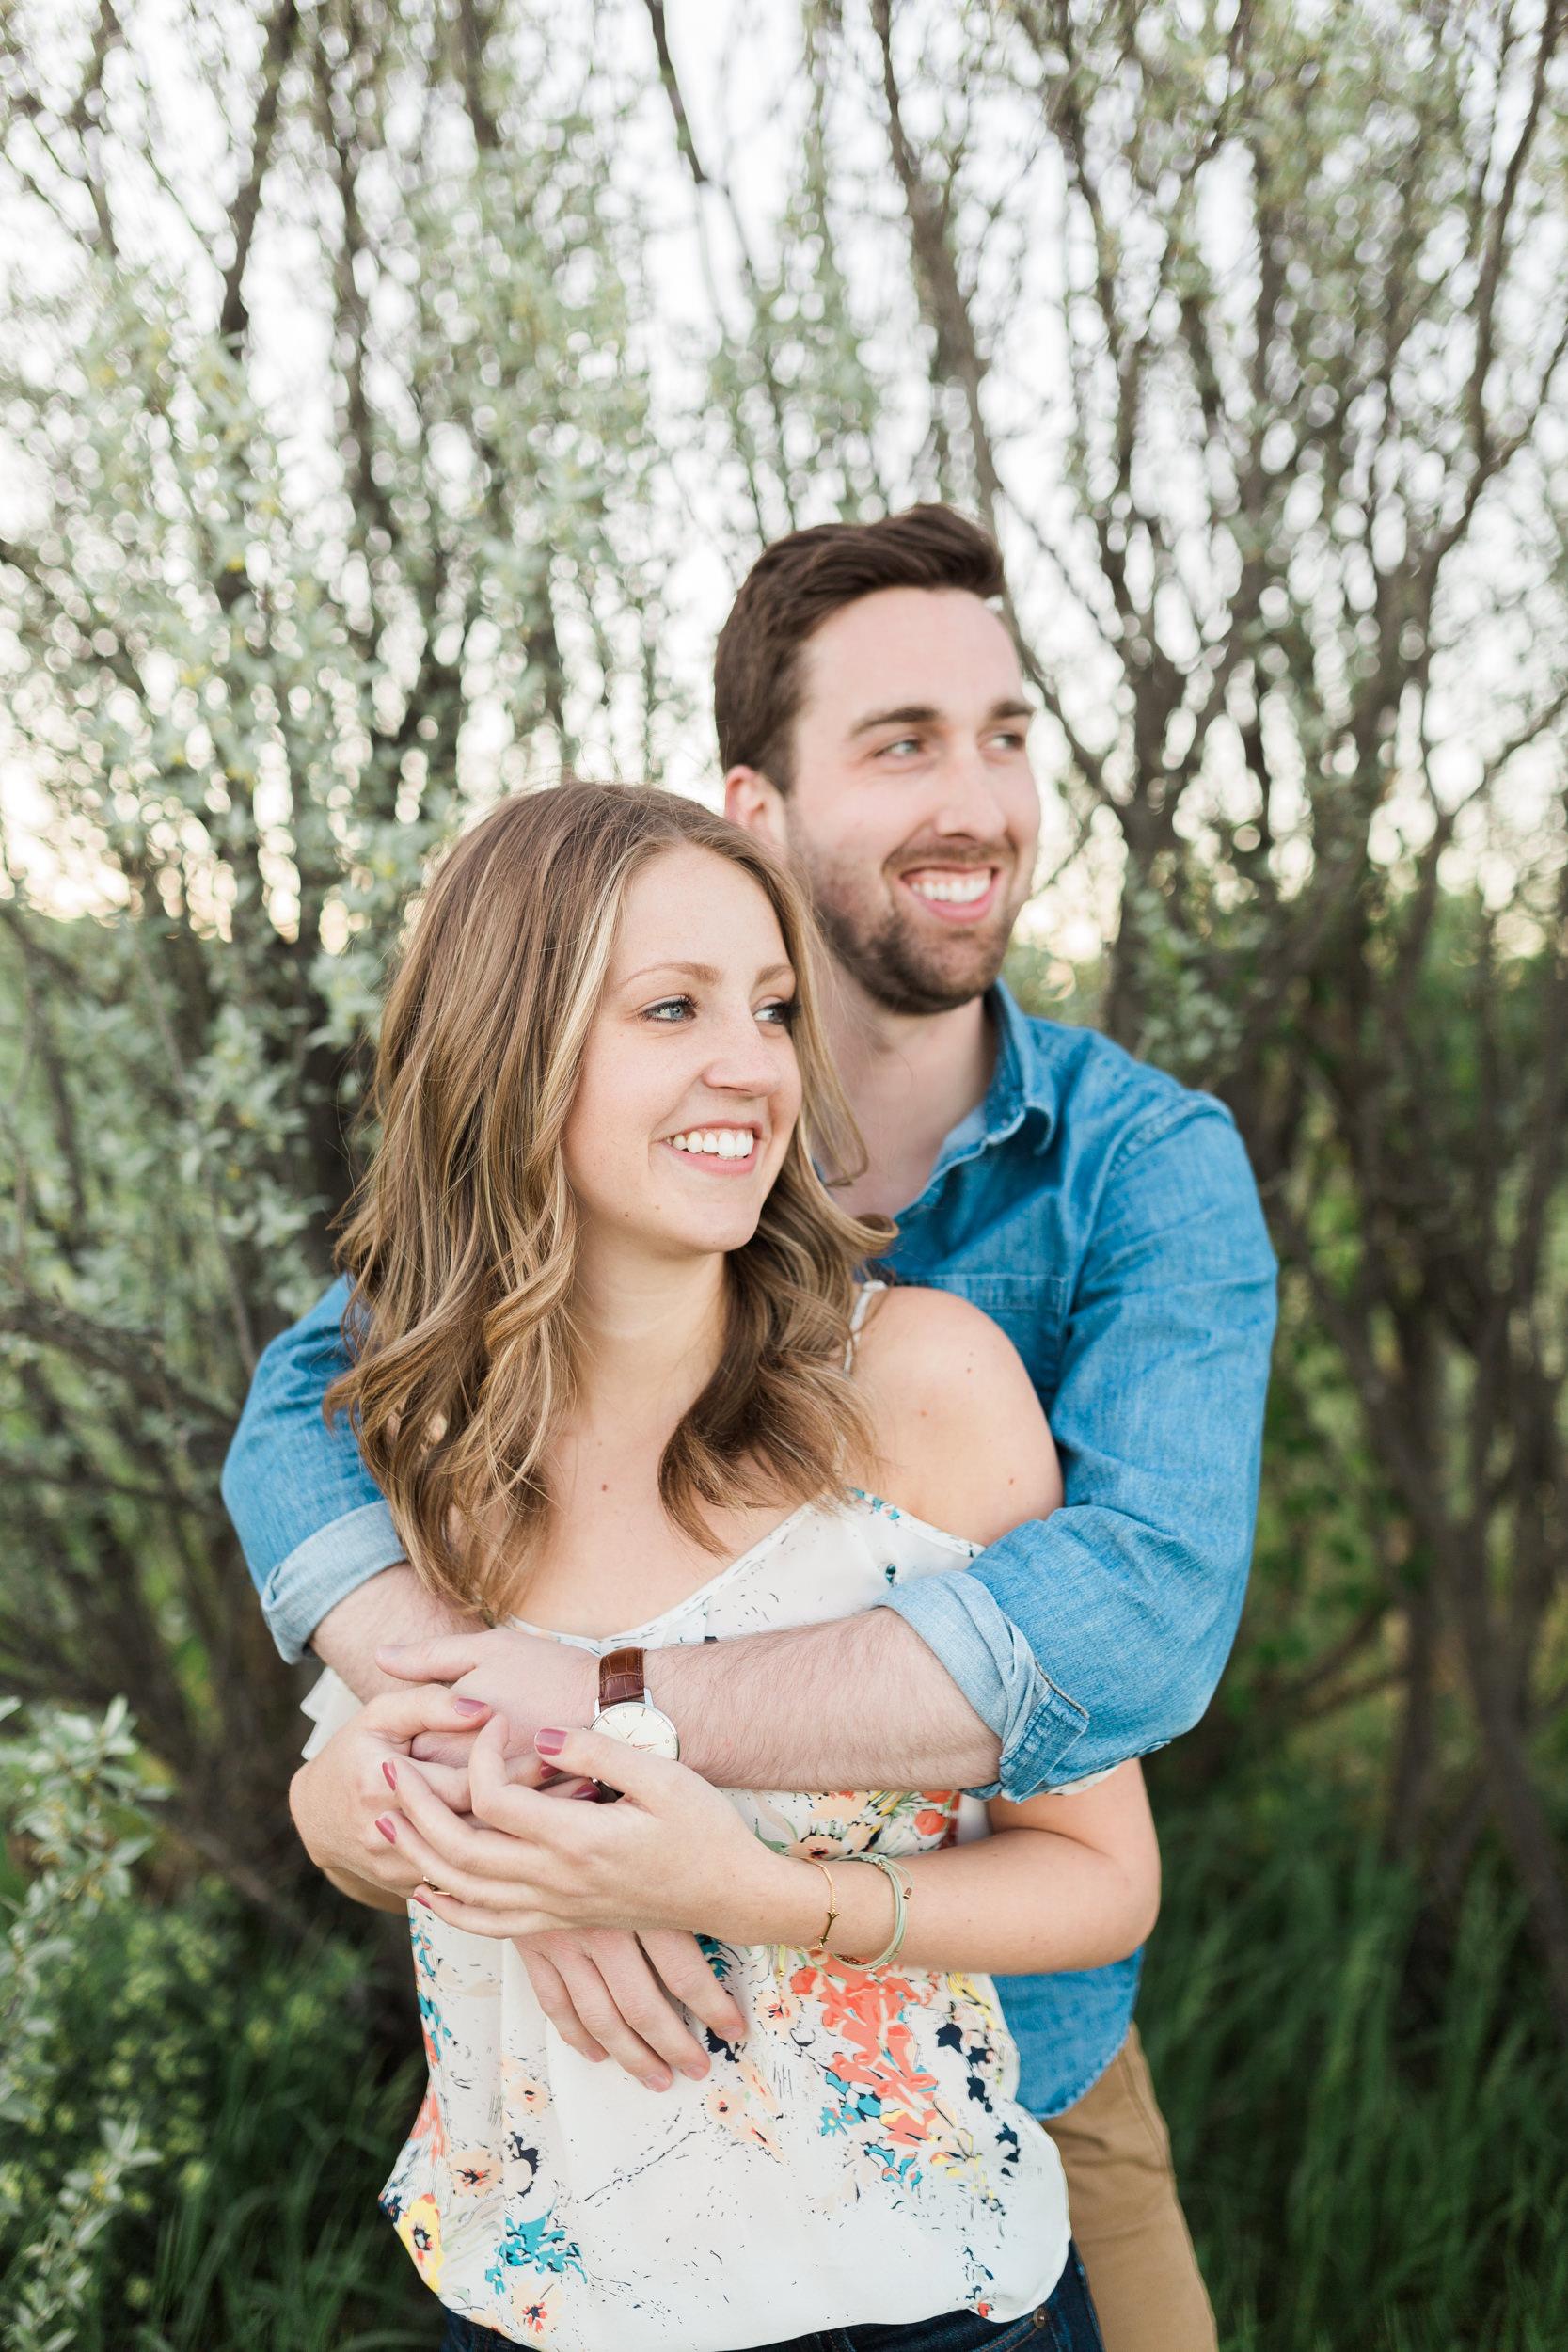 Calgary-wedding-photographers-photos-banff-engagement-16.jpg